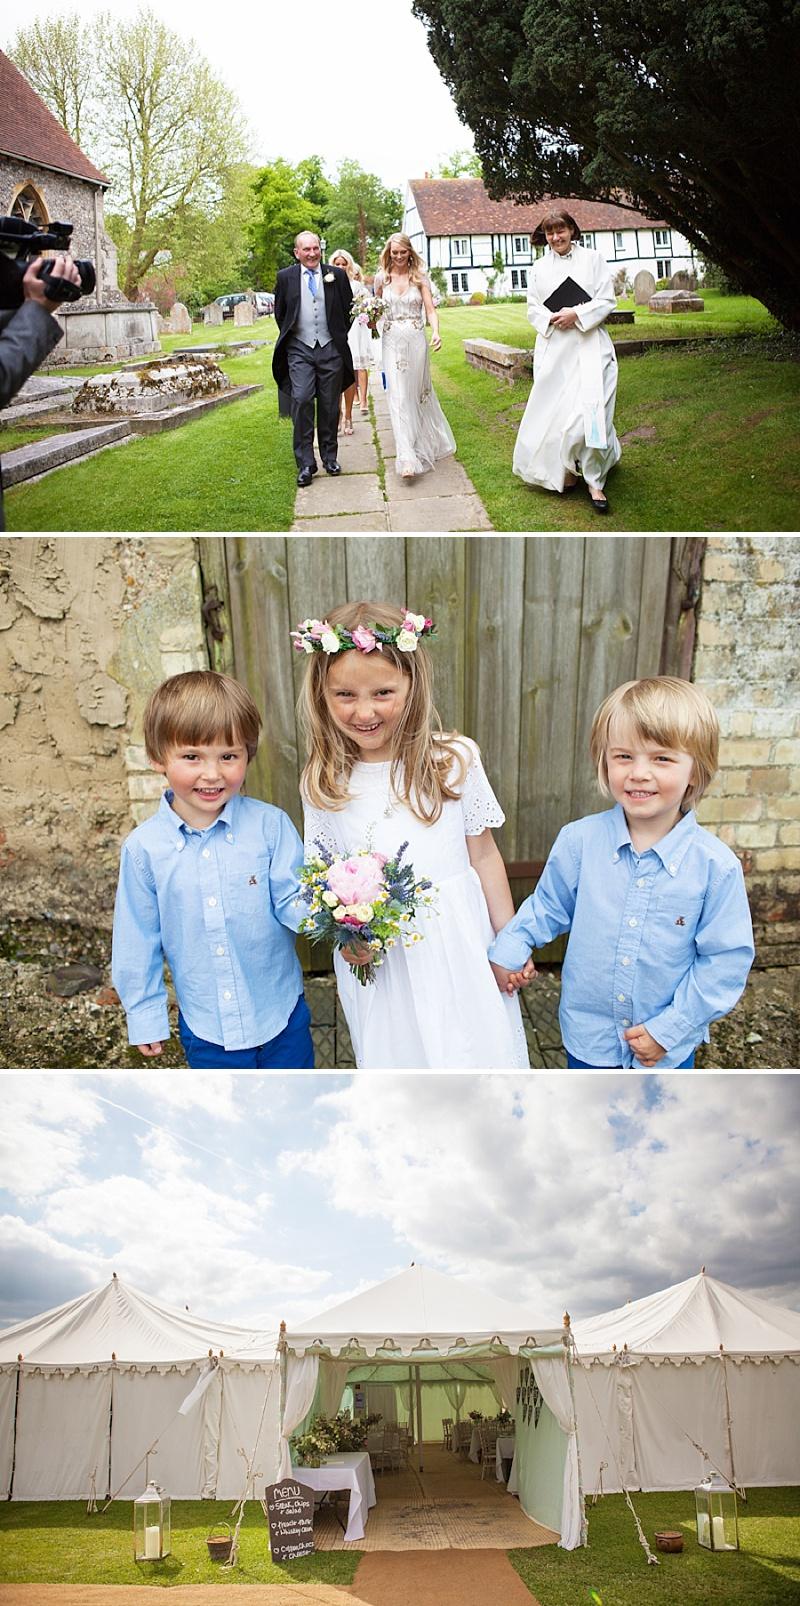 Summer Garden Party Wedding In Hertfordshire, Bride In Jenny Packham Eden Gown, Images by Annamarie Stepney_0007